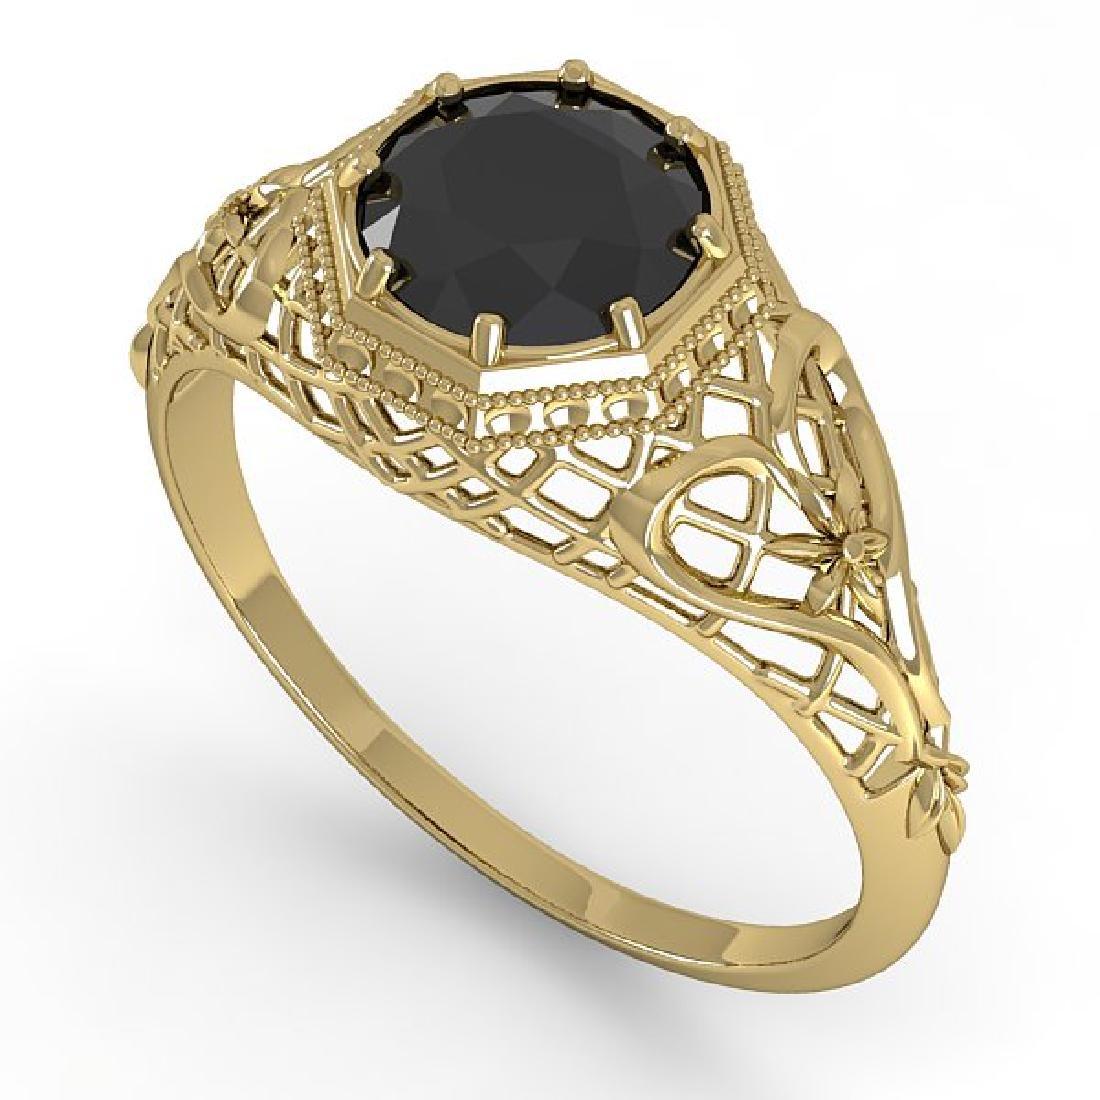 1.0 CTW Black Certified Diamond Ring Art Deco 14K - 2